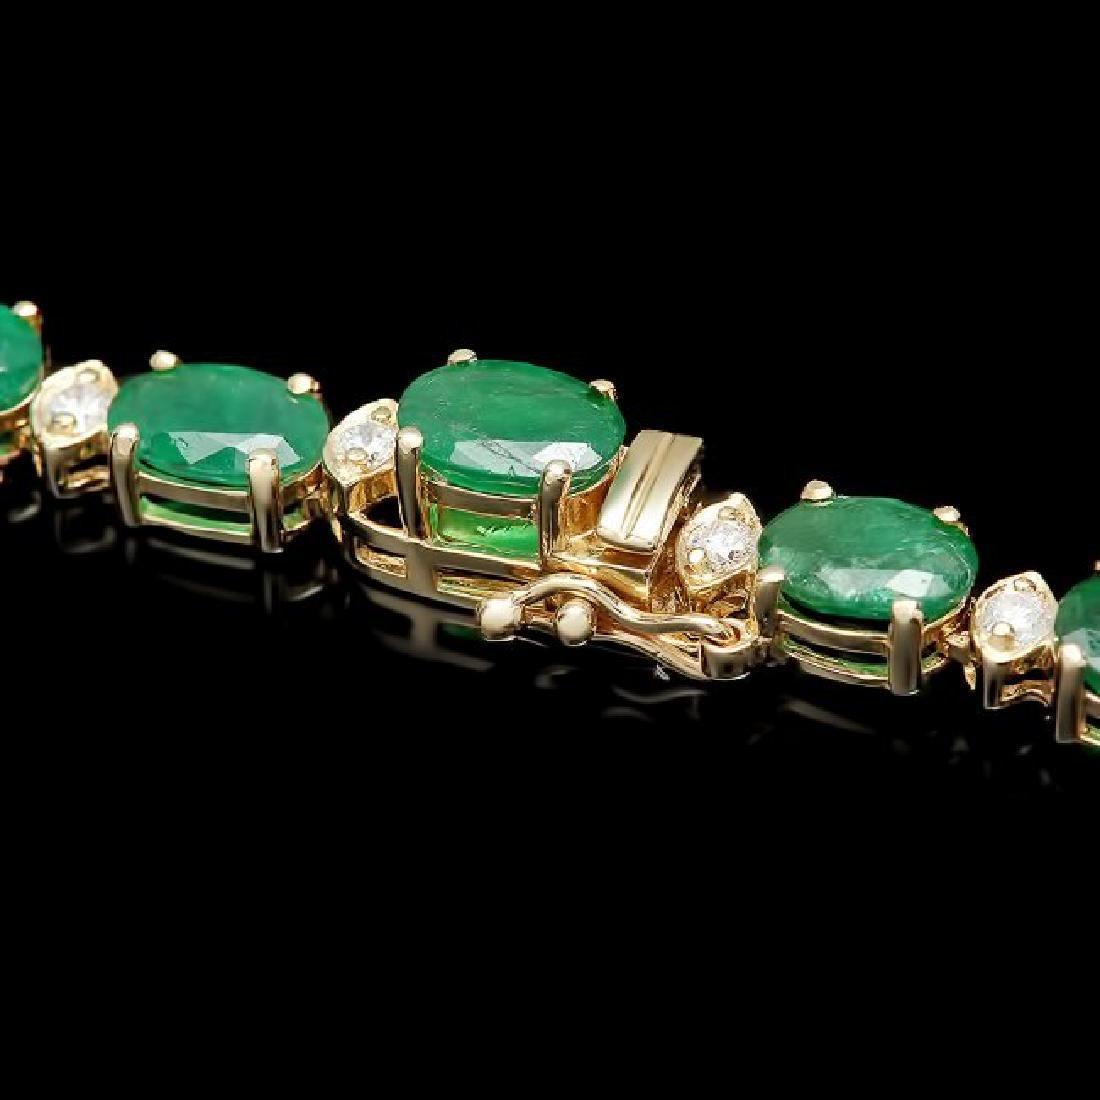 14k Gold 24.25ct Emerald 2.00ct Diamond Necklace - 3